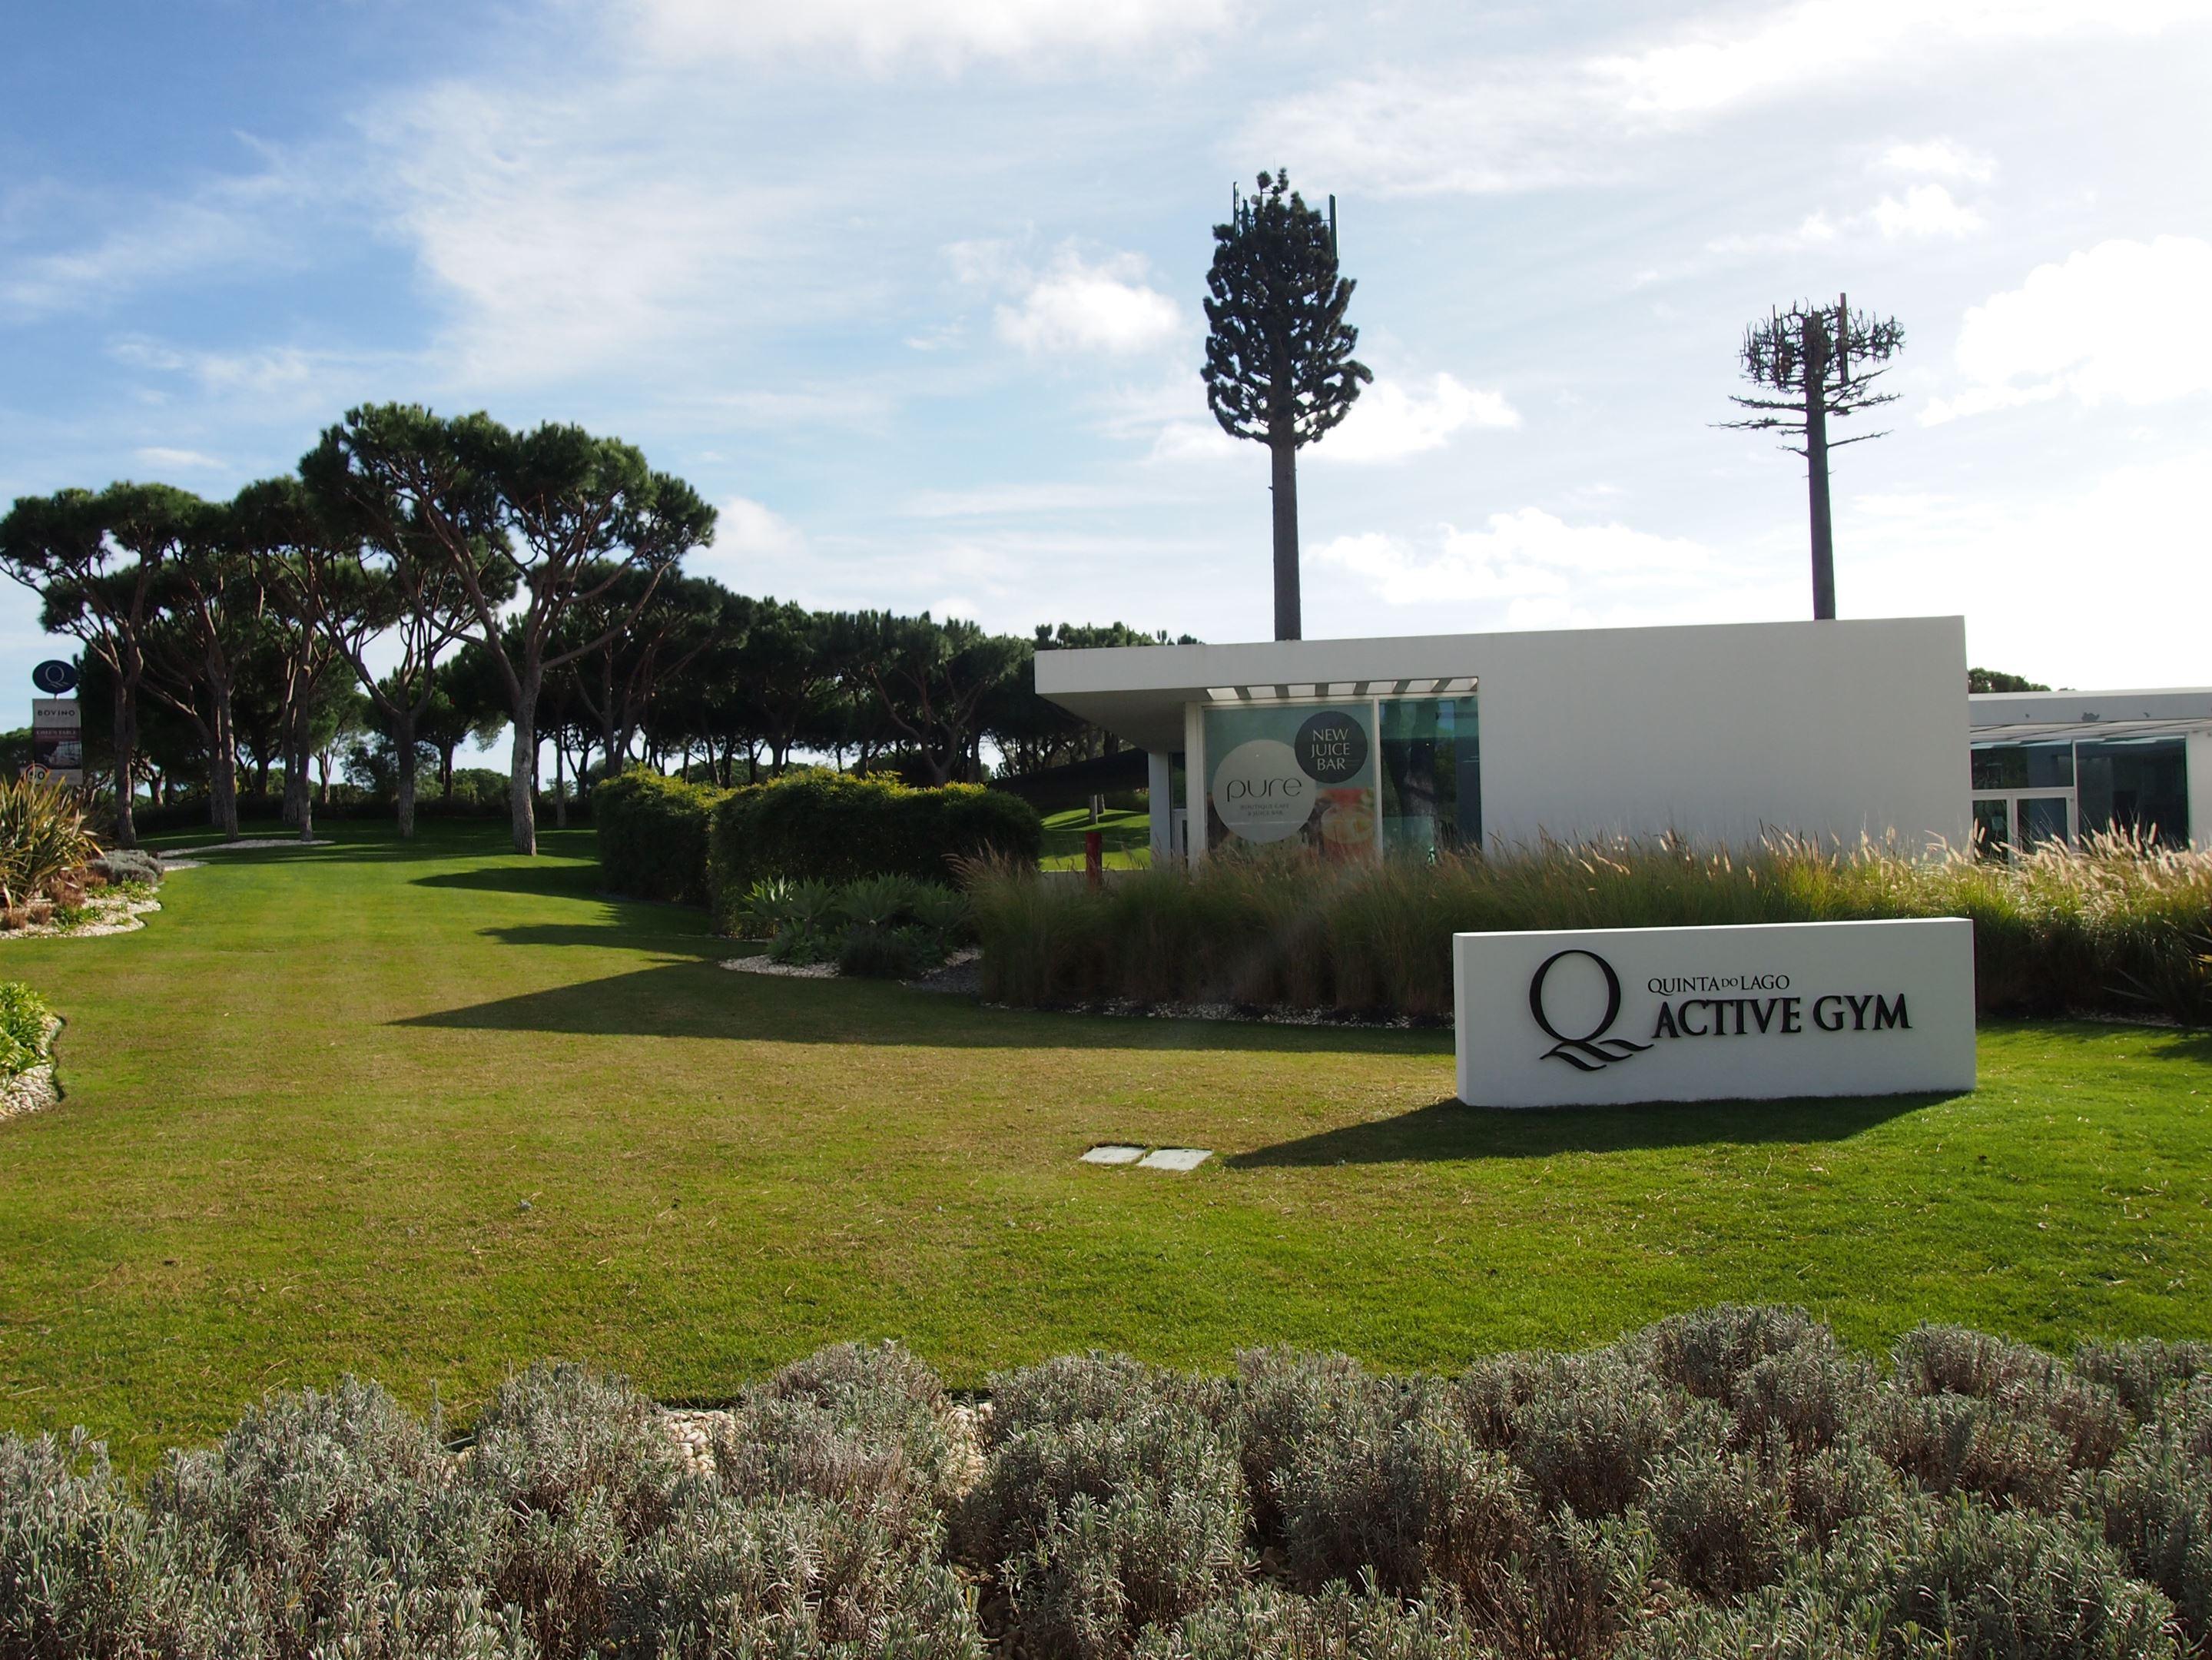 Algarve Gyms - Quinta do Lago gym Active Q